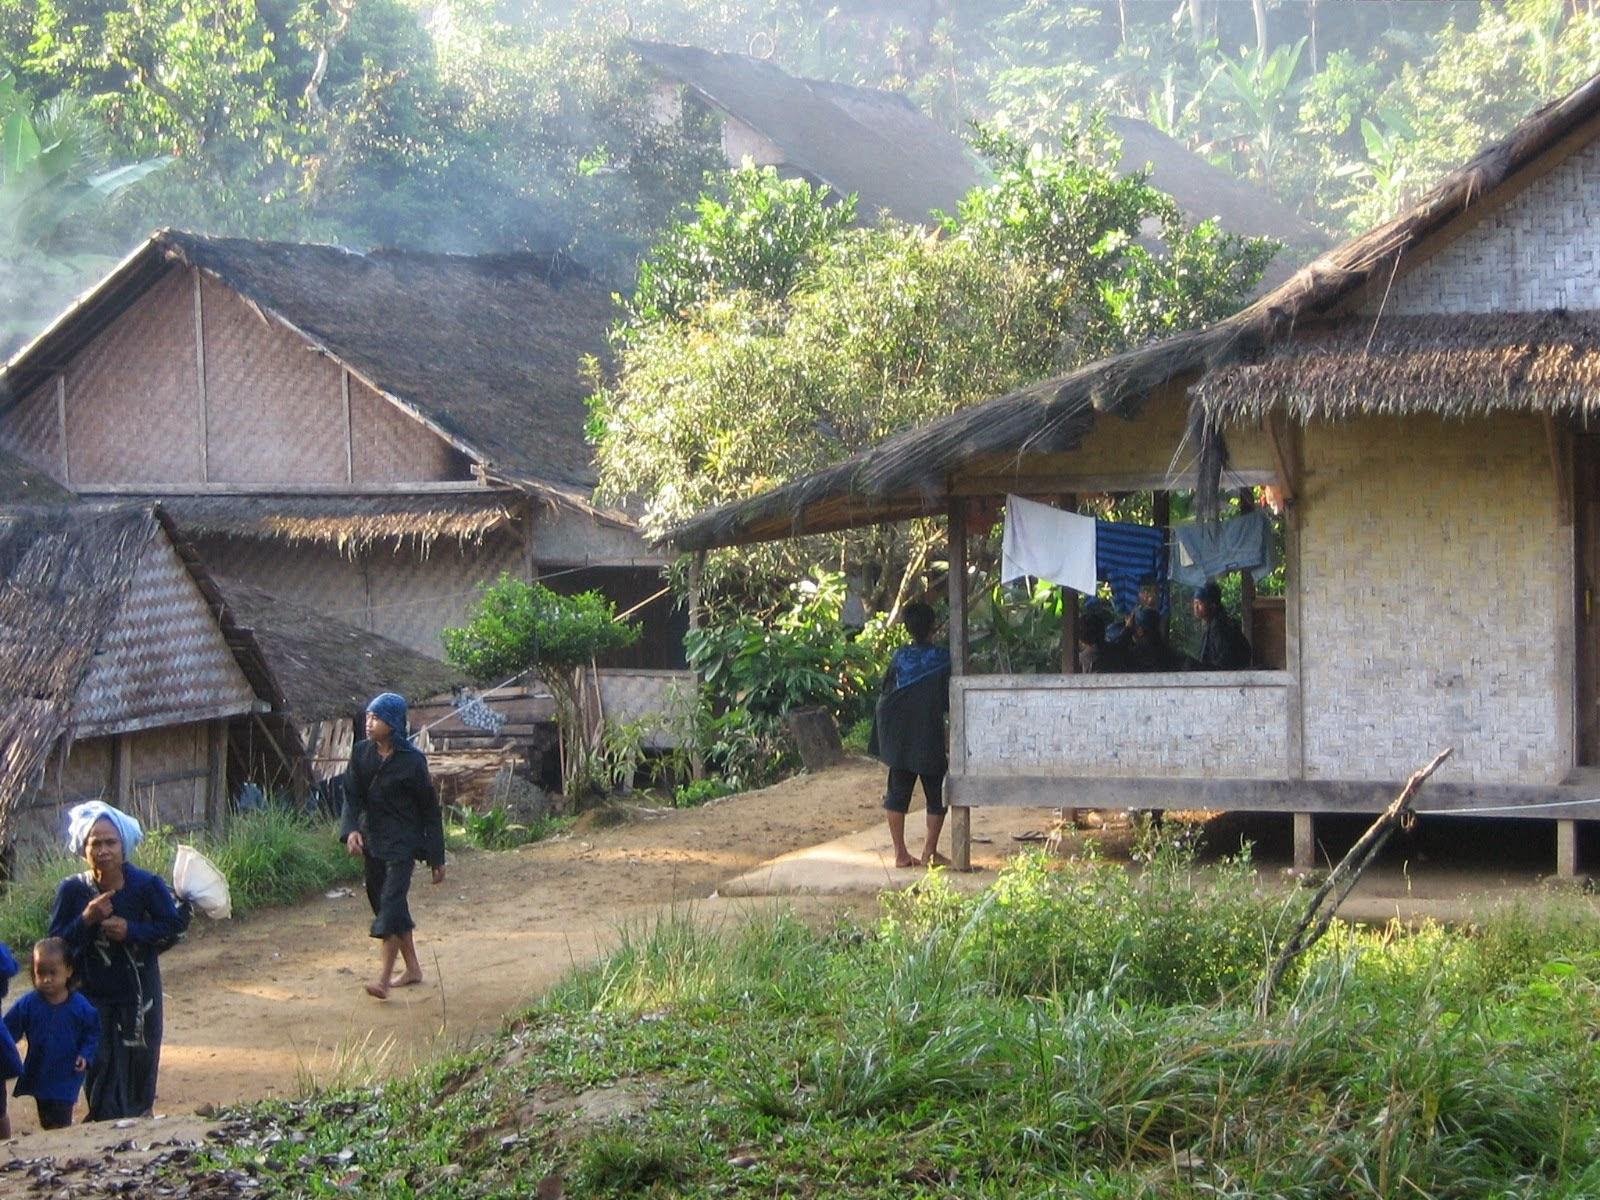 Mengenal Rumah Adat Suku Baduy Kang Muroi Perkampungan Tradisional Kab